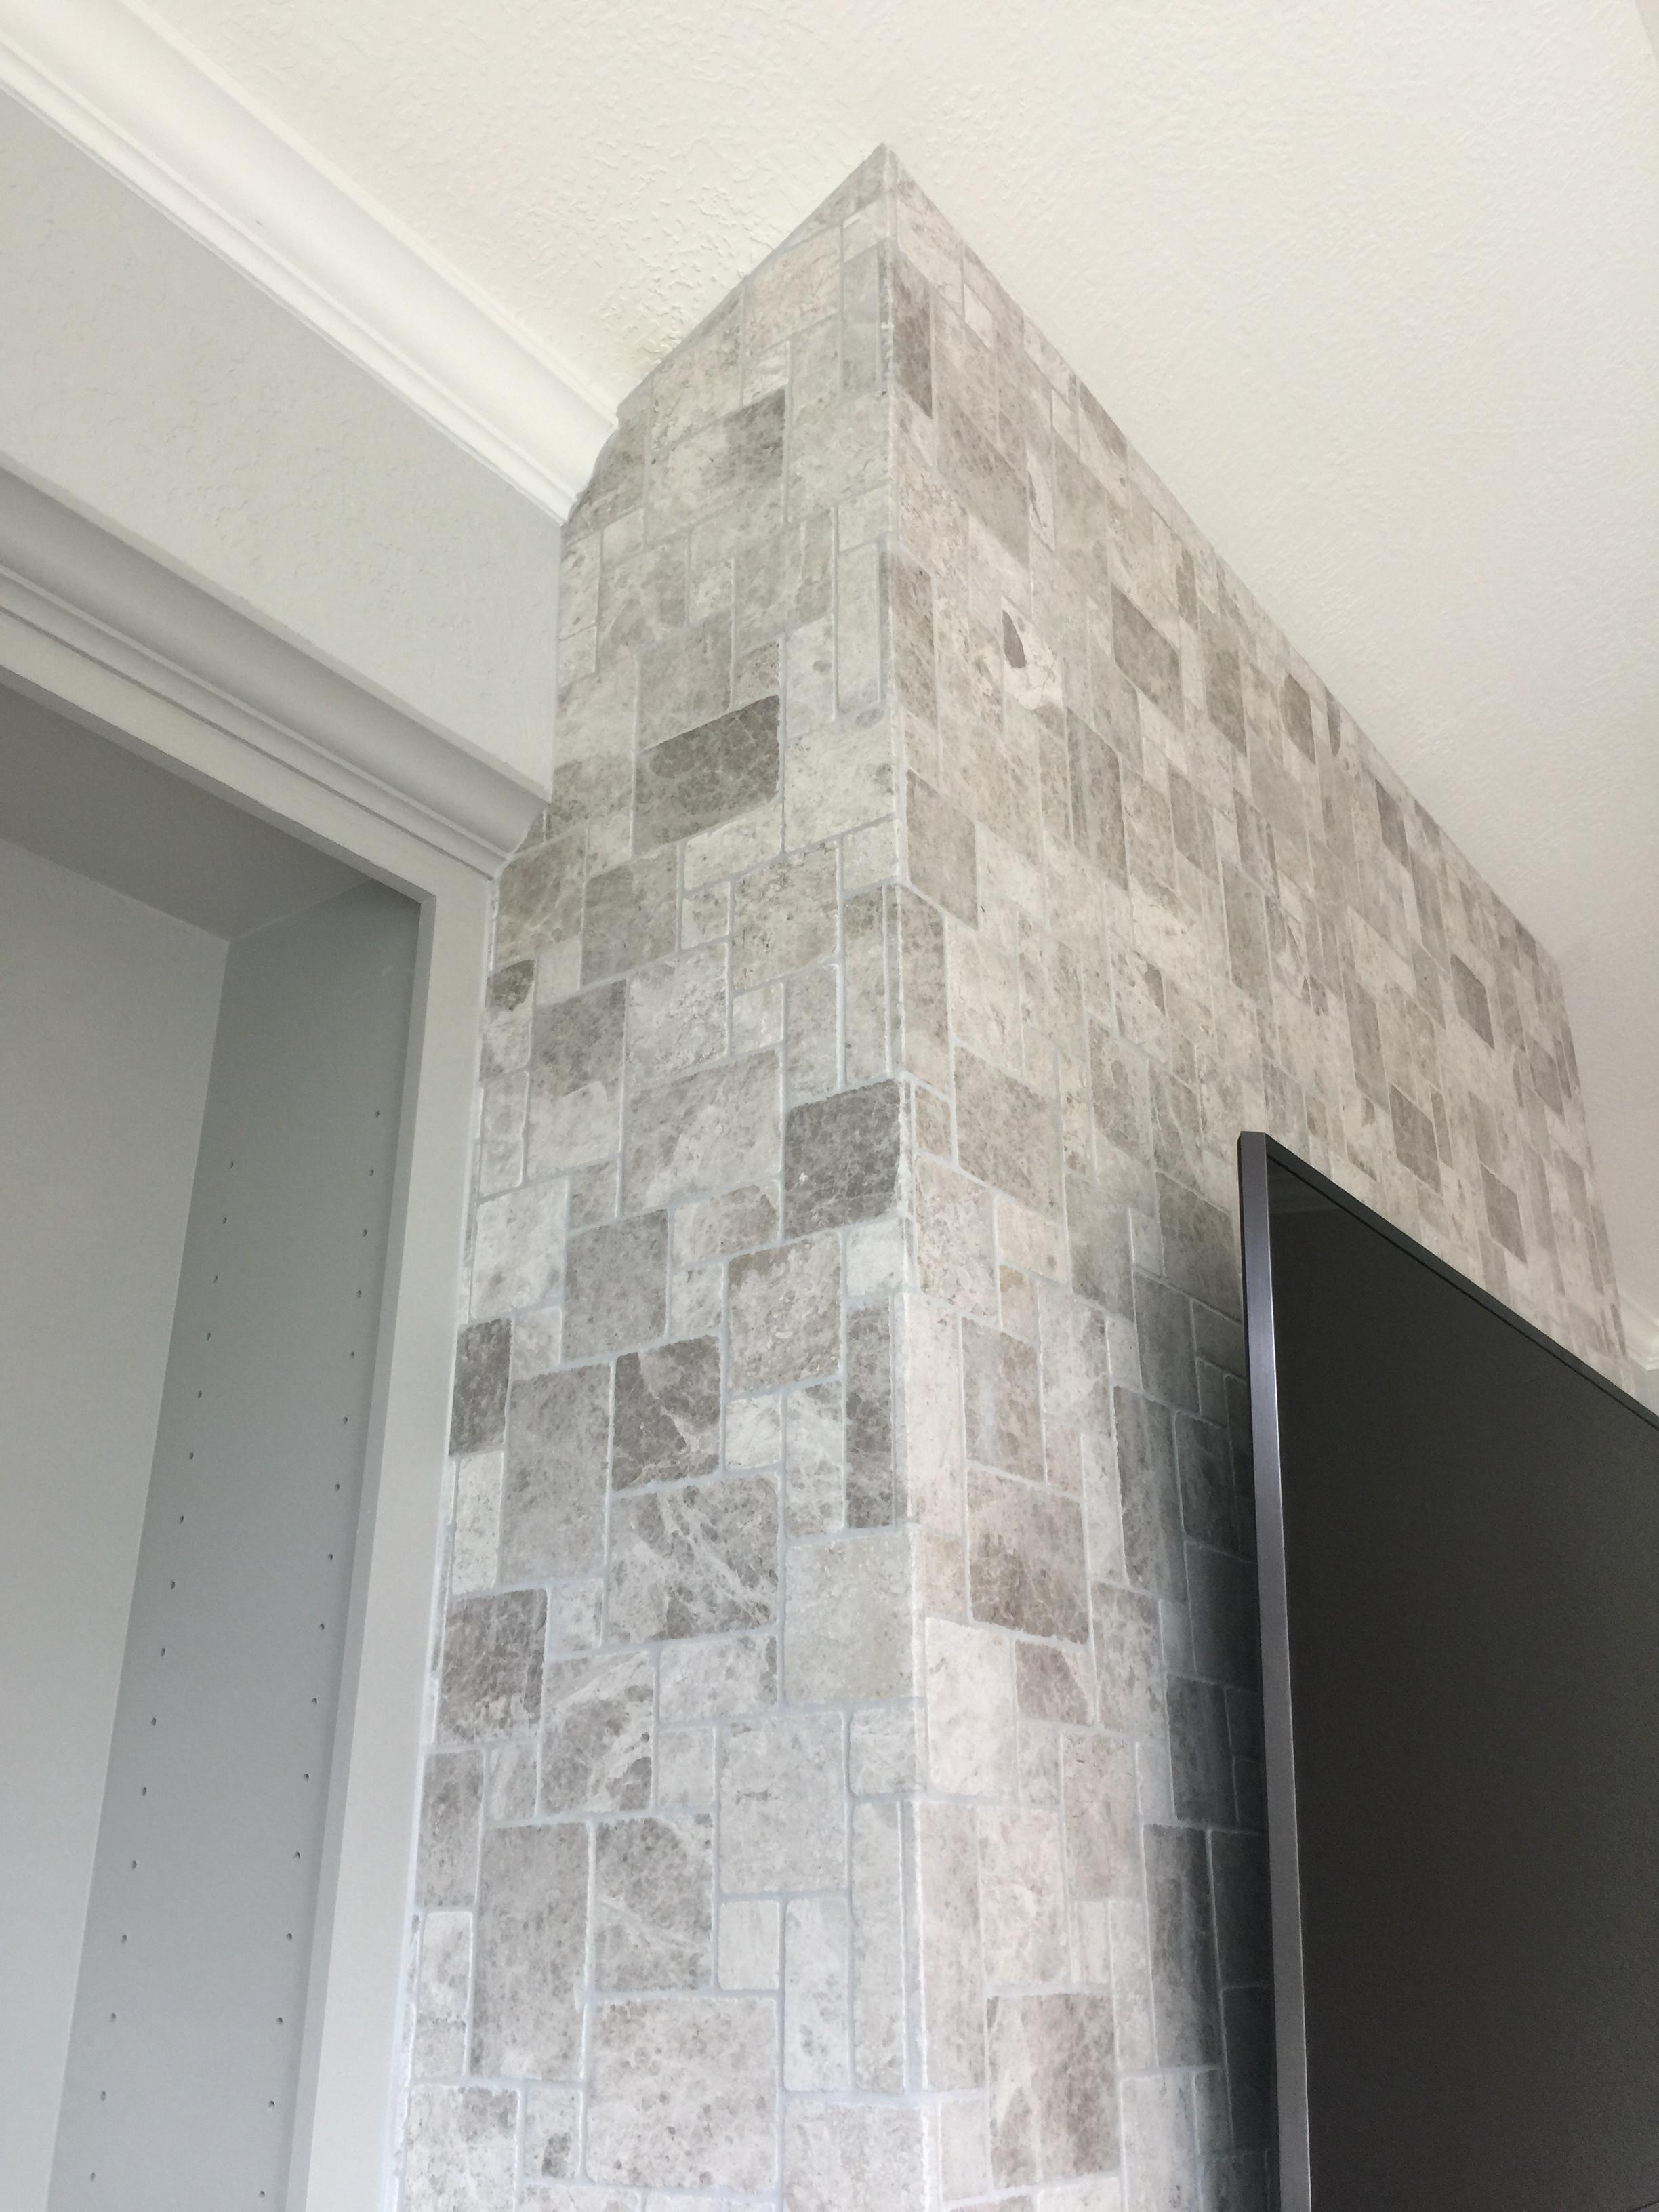 tile or stone cladding